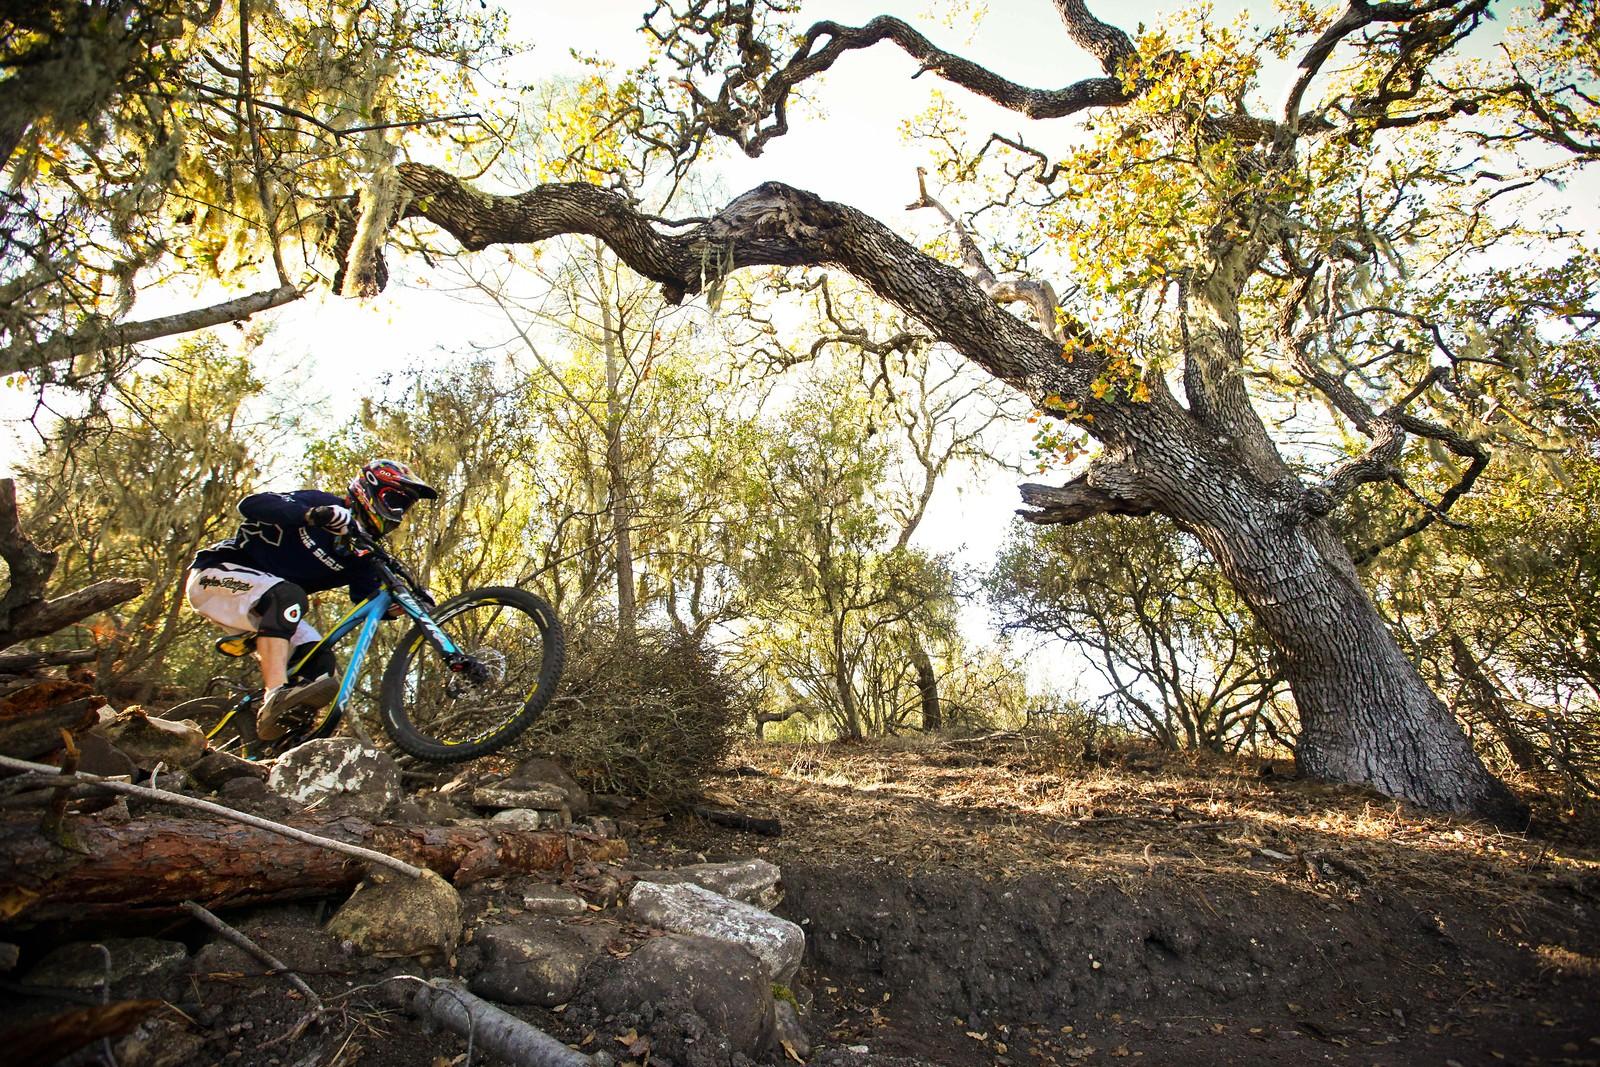 Vance Bennet on the Norco Aurum - GnarHuck - Mountain Biking Pictures - Vital MTB